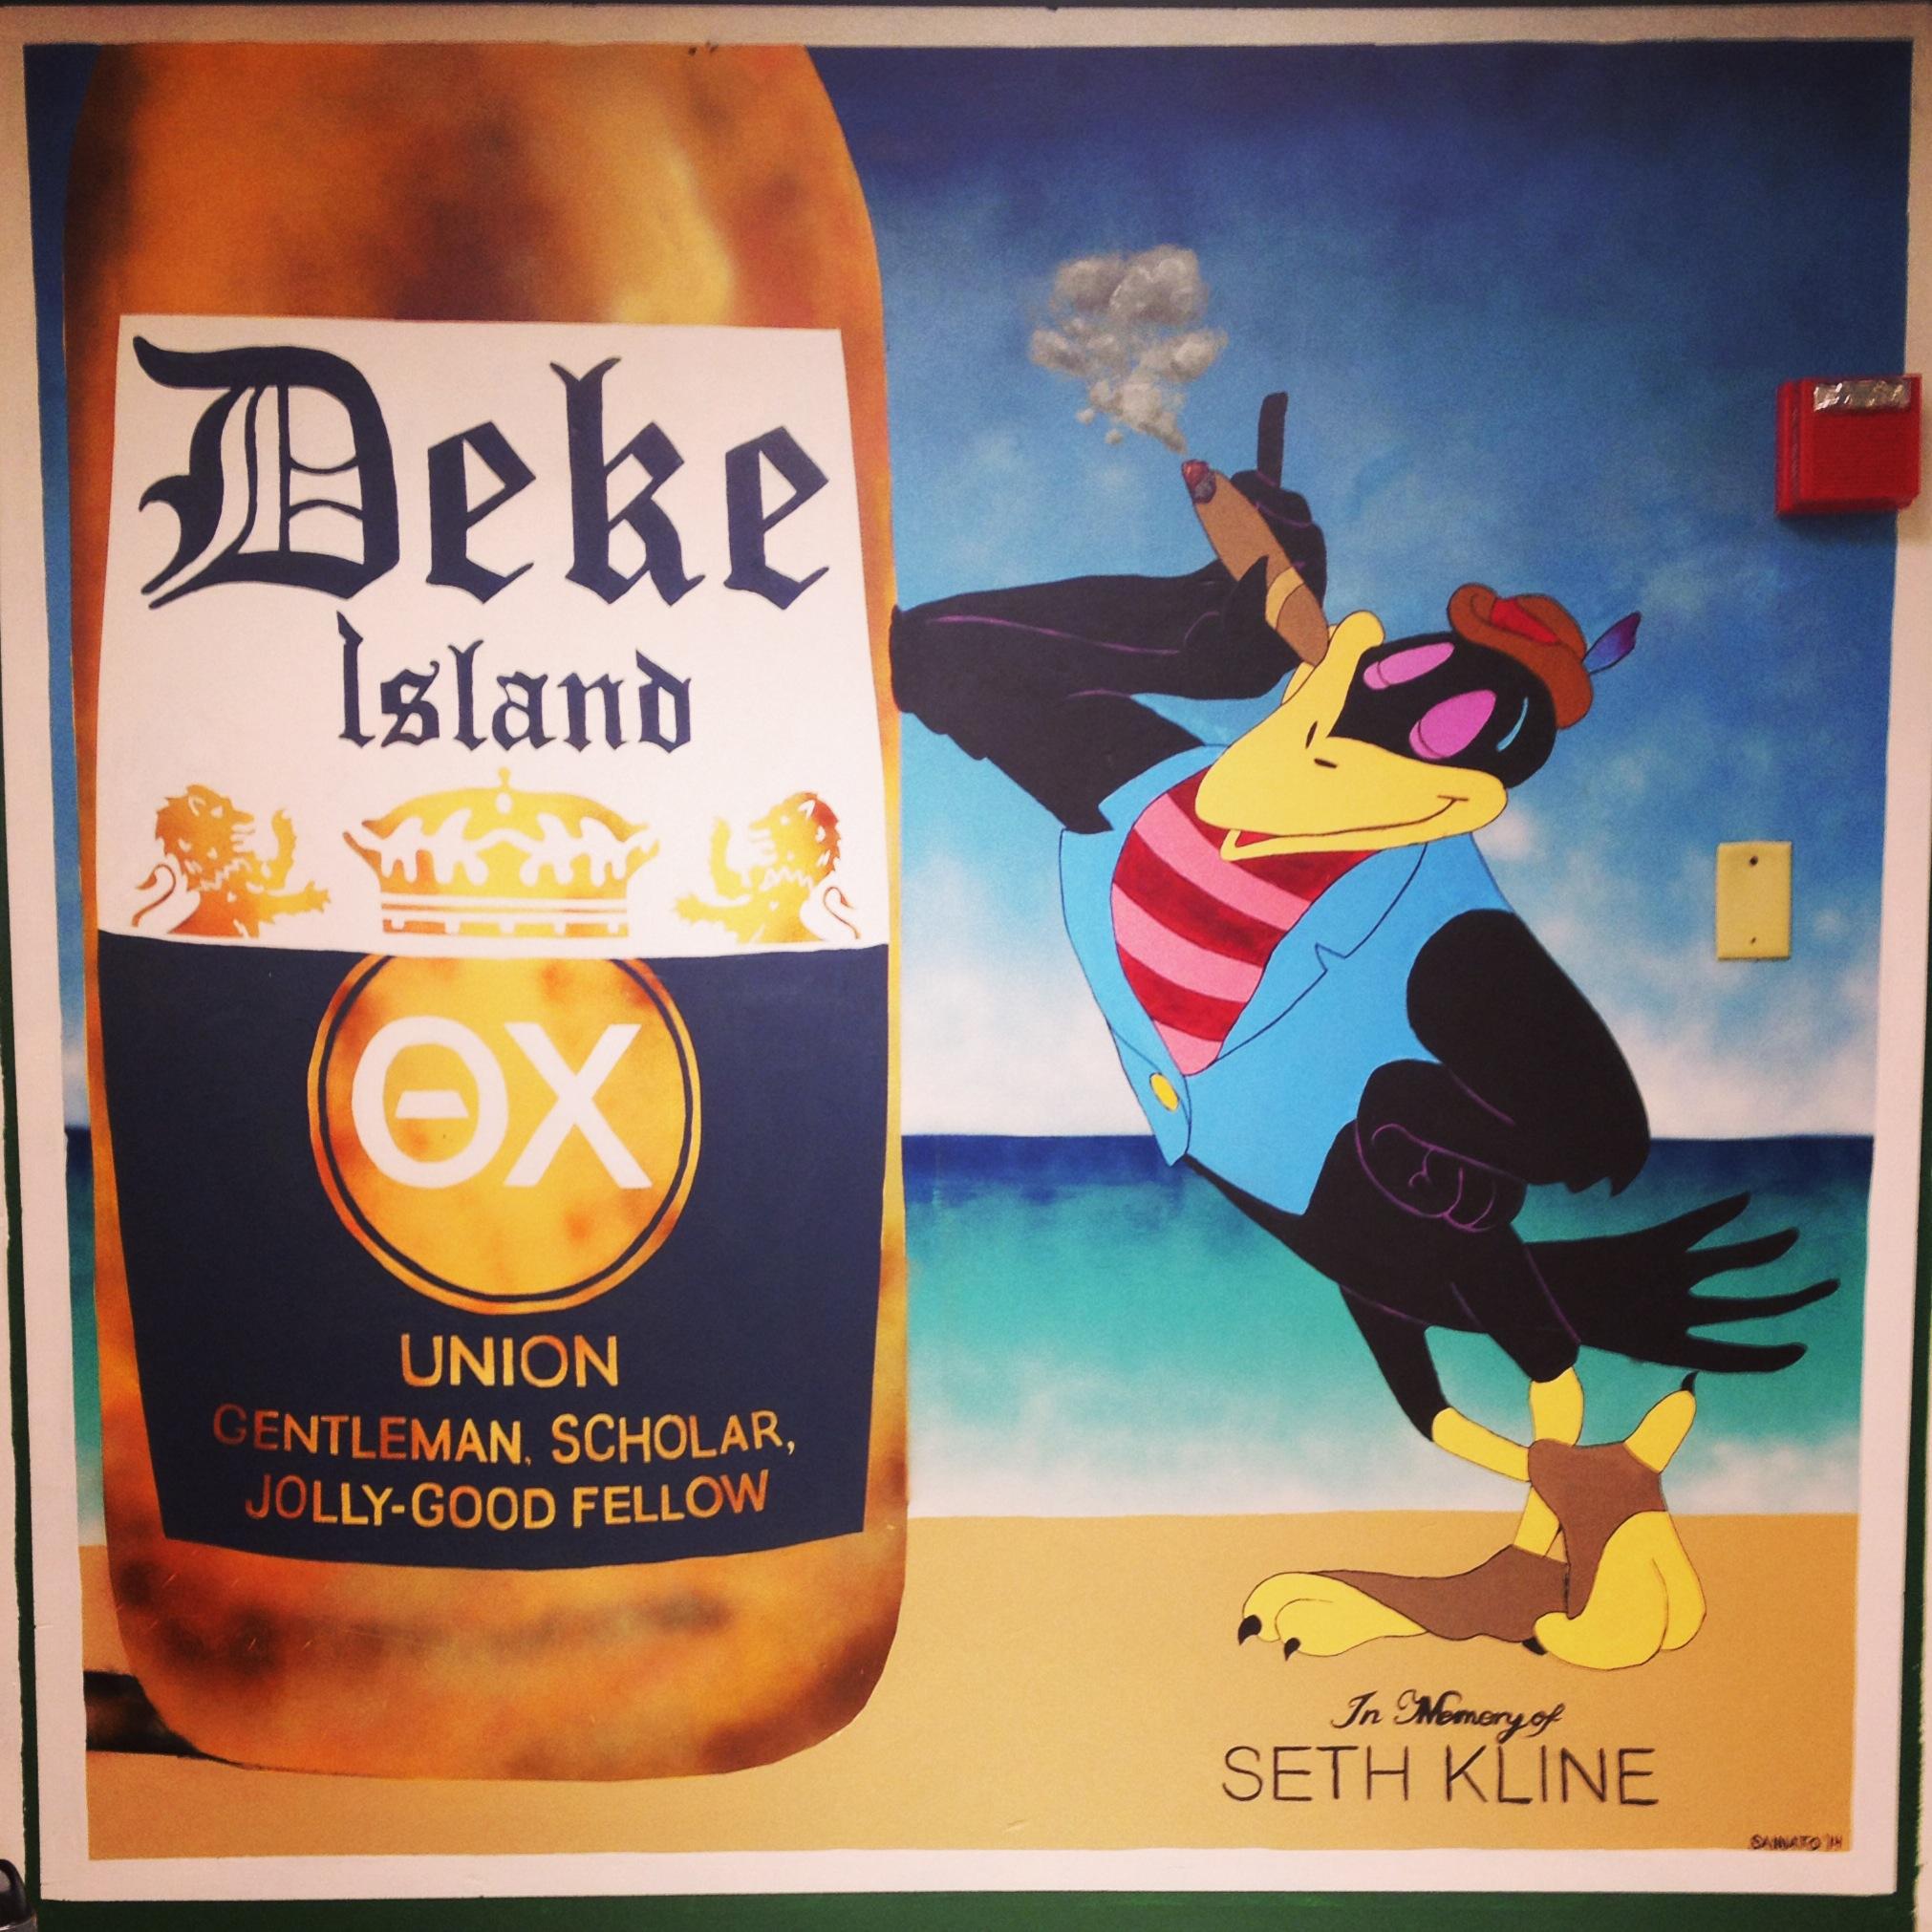 Deke Island Mural